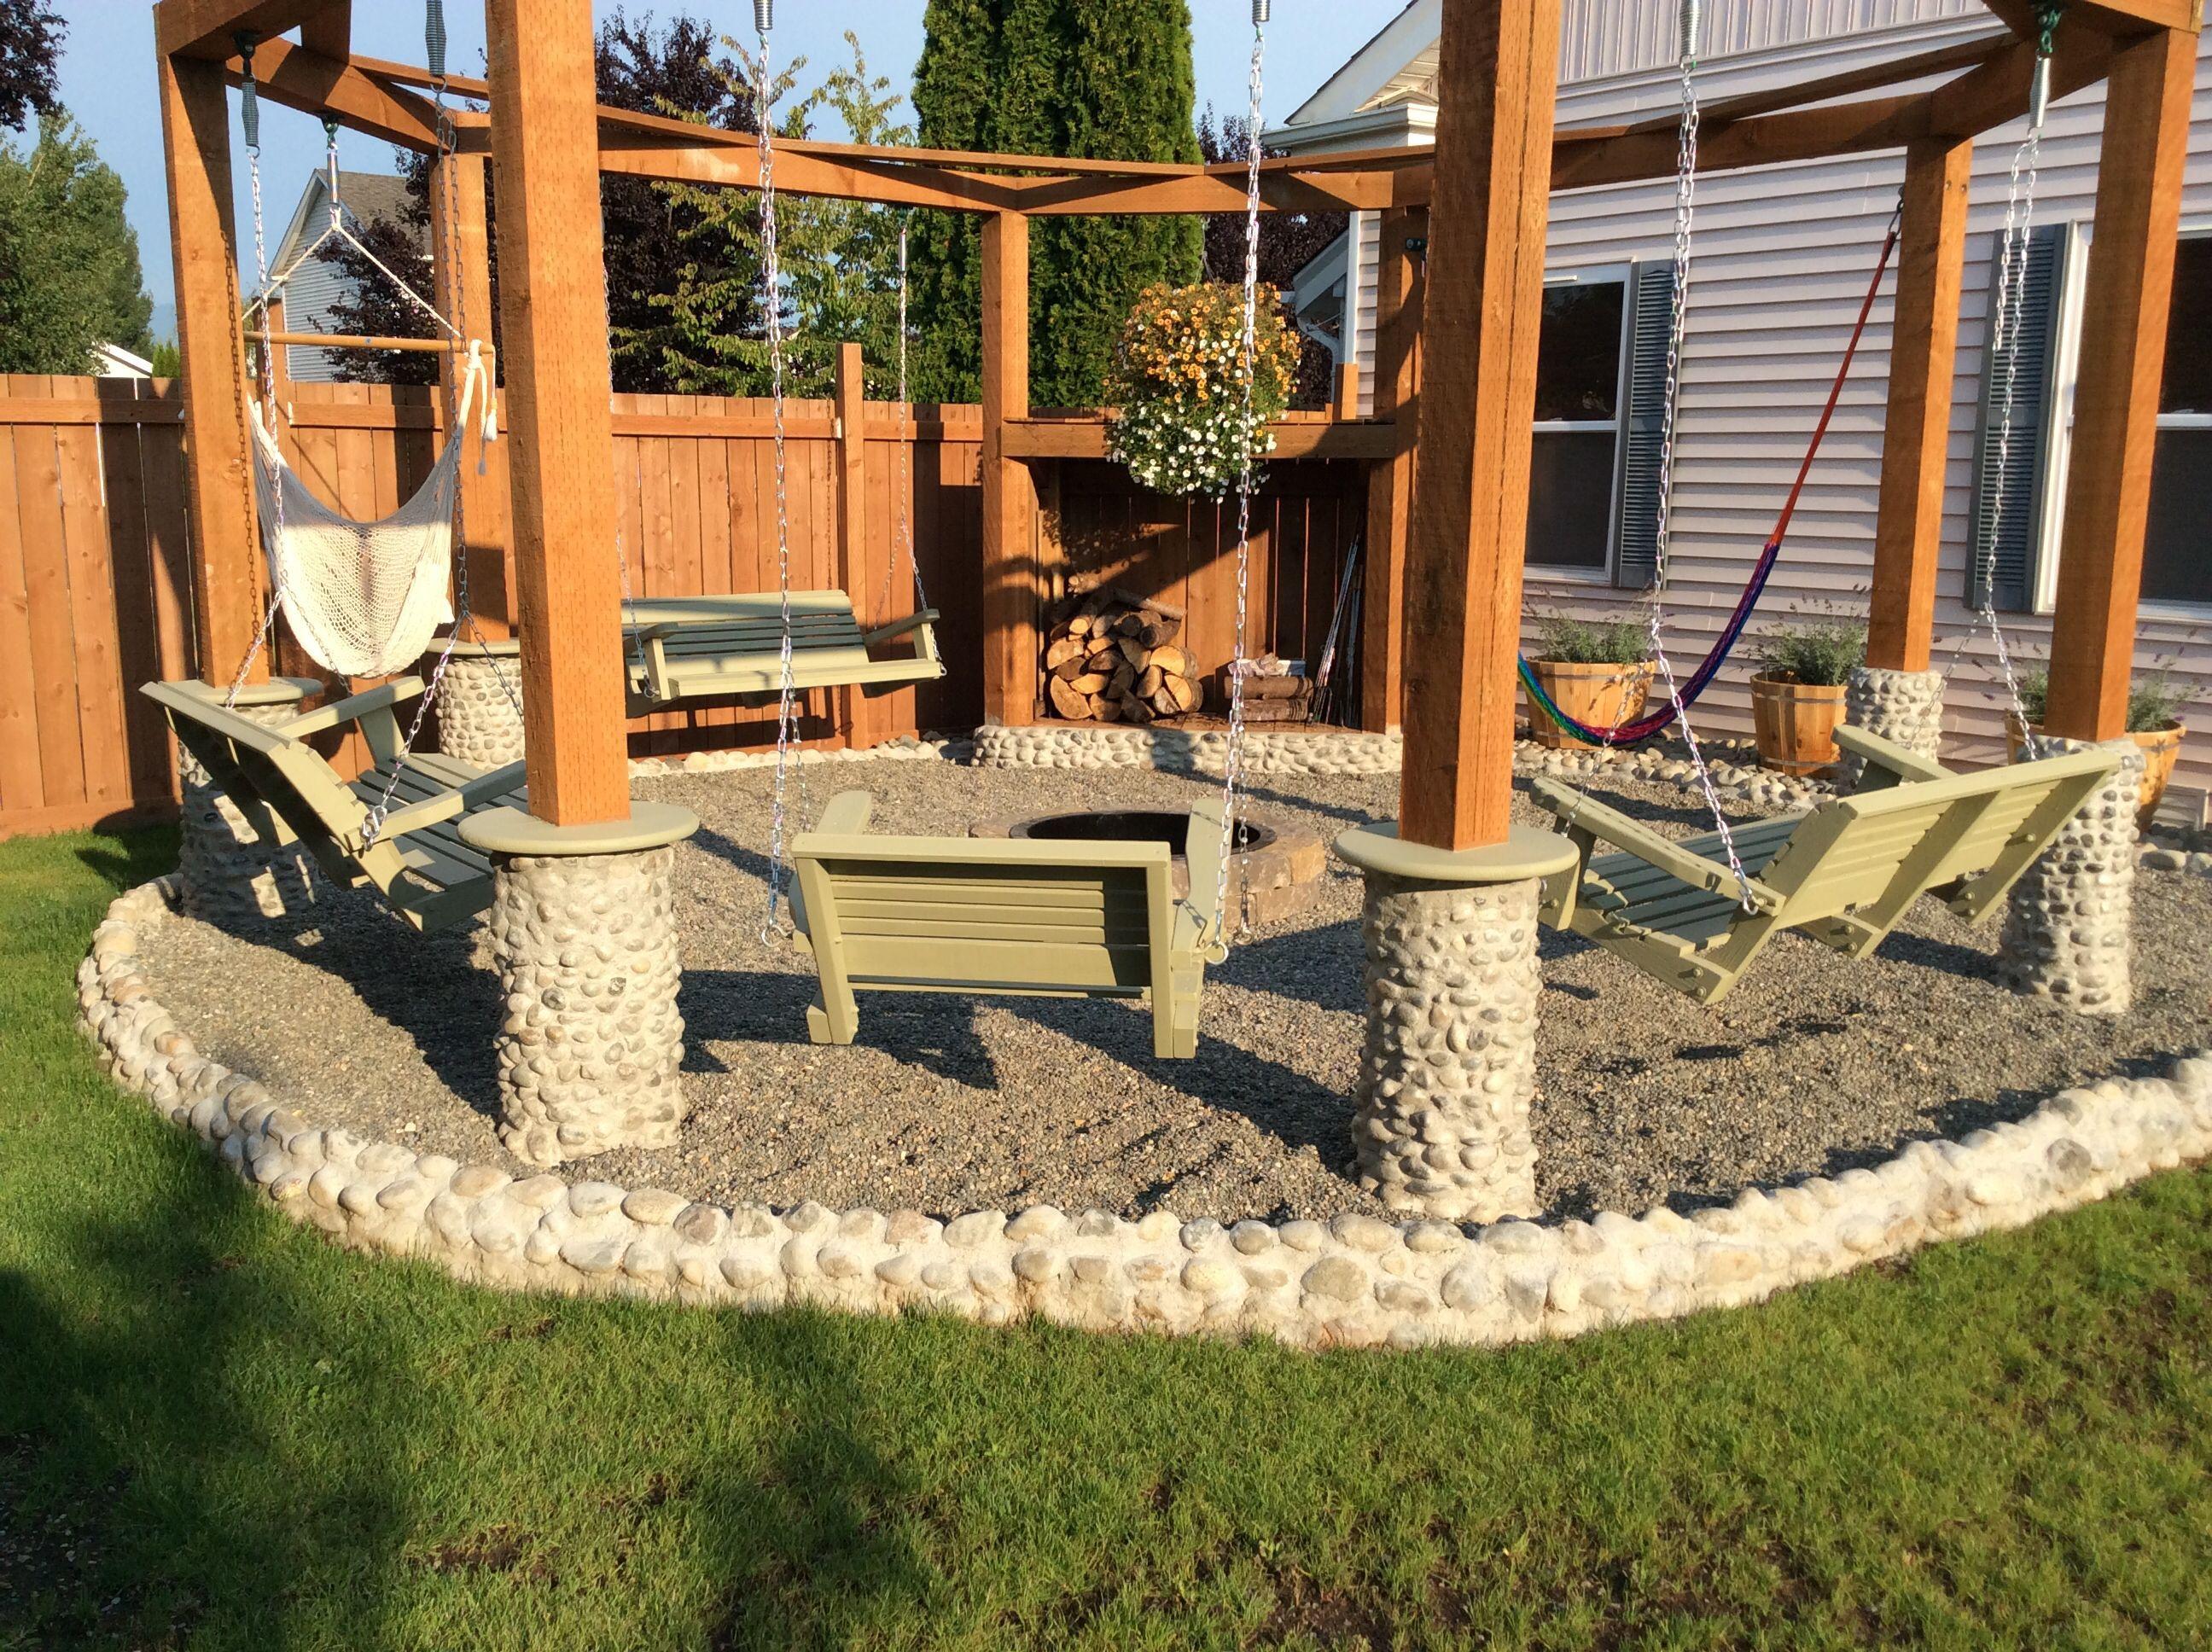 Fire pit decor backyard designs large fire pit focal pointsfire pit